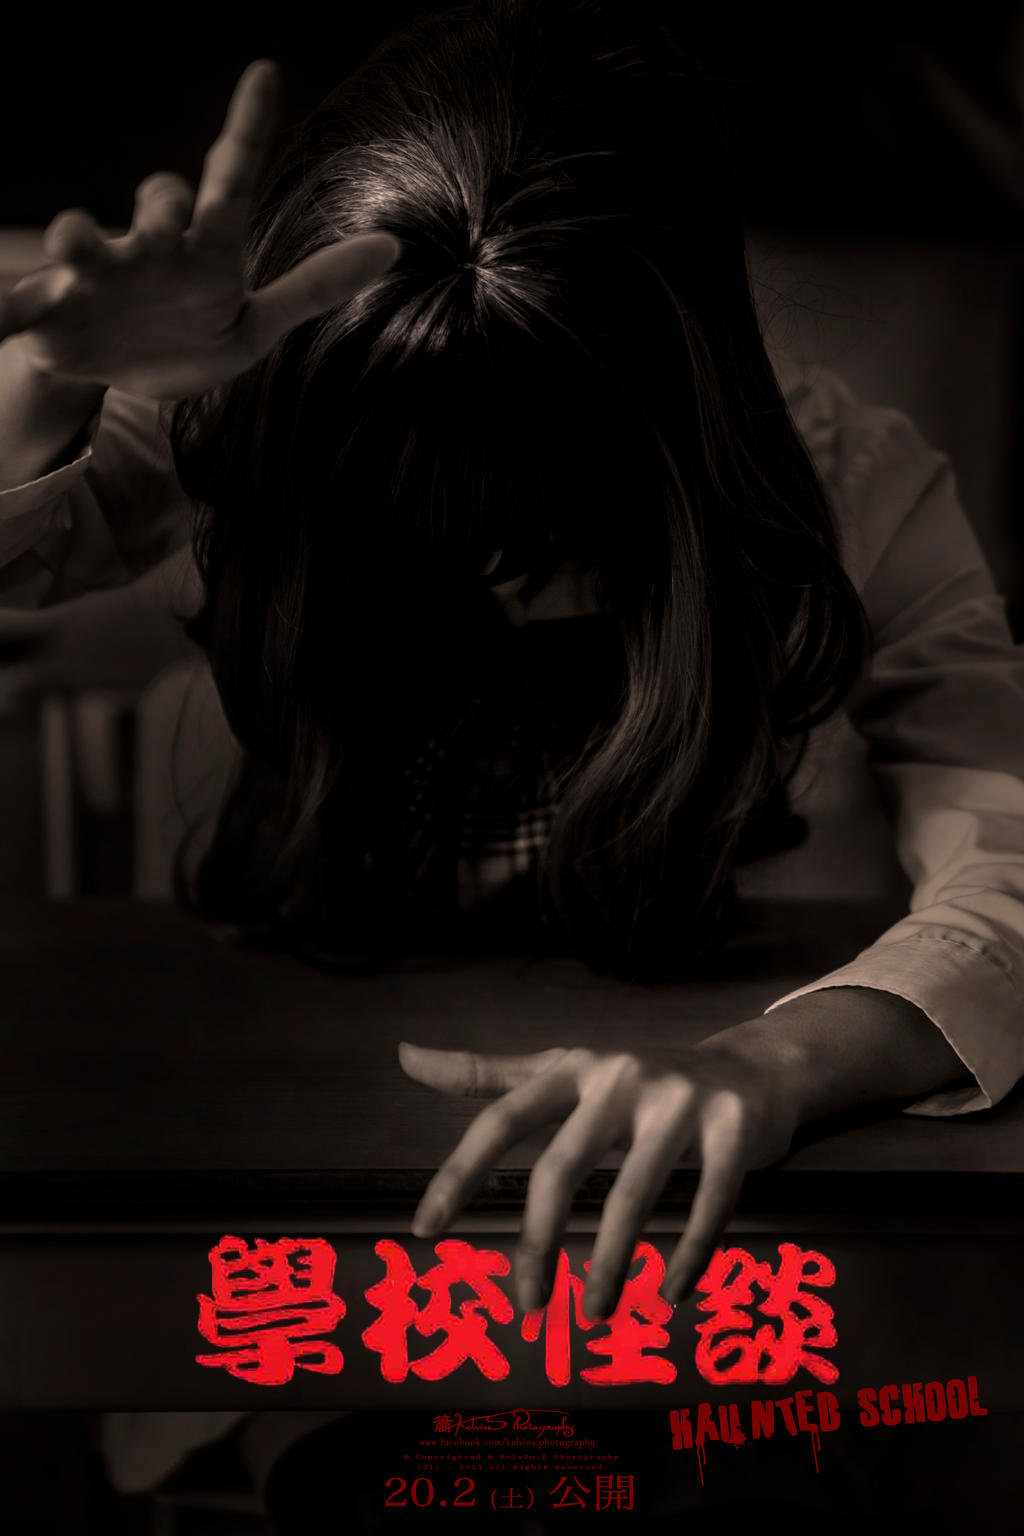 japanese horror movie poster by kelvinsiau on deviantart